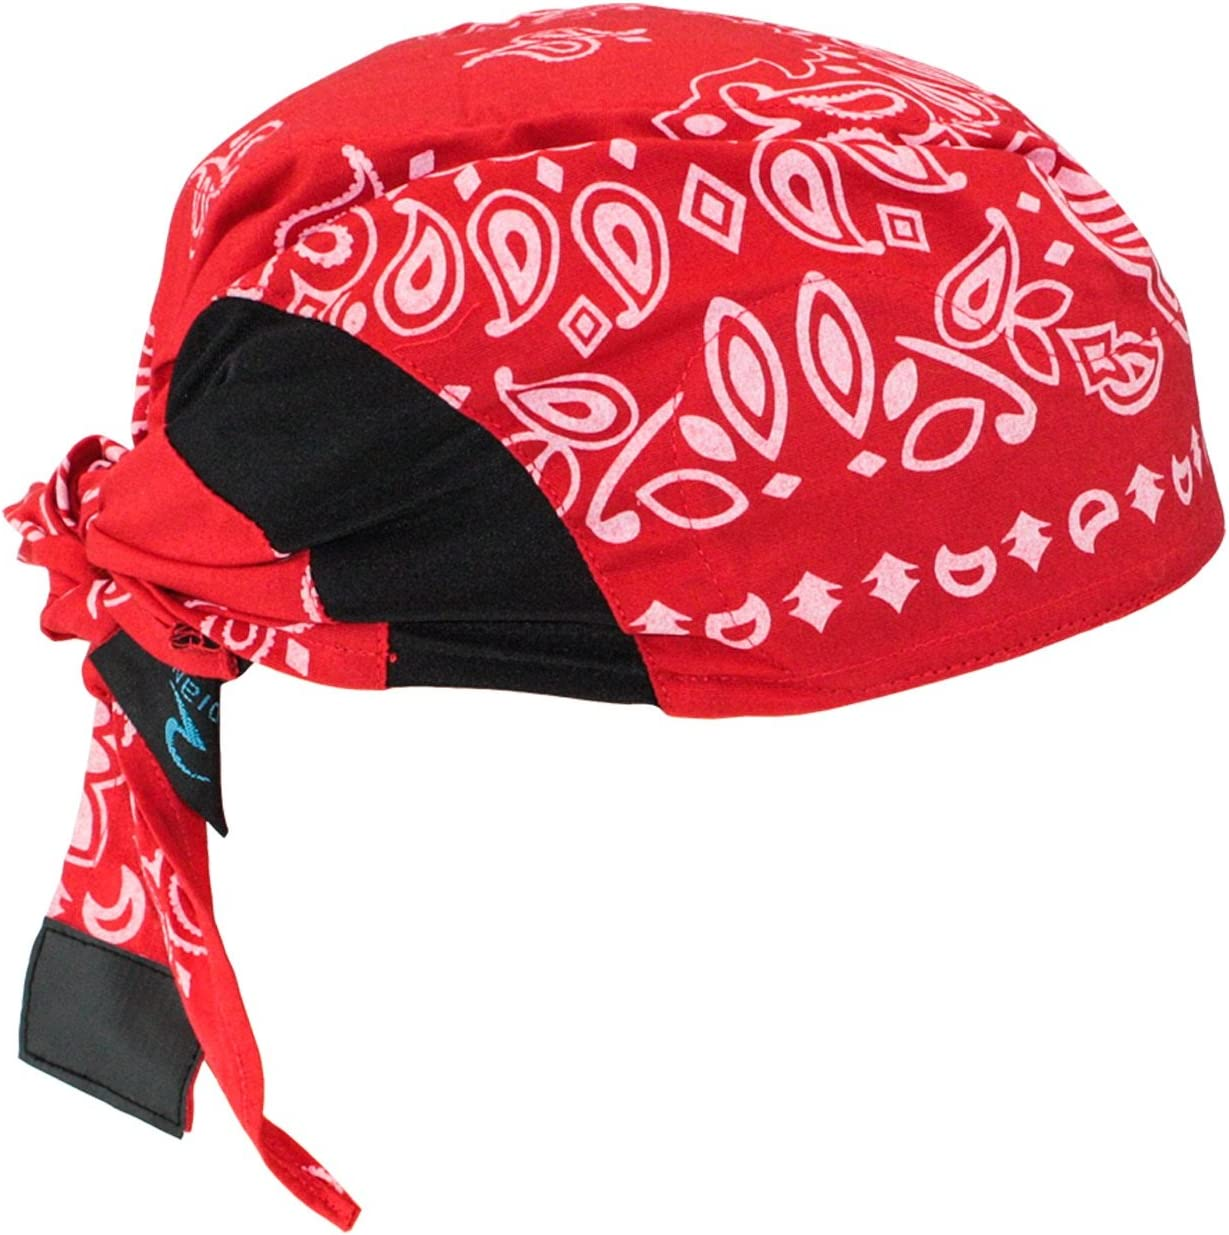 Radians RCS307 Arctic Skull Cooling Headshade, Red Paisley